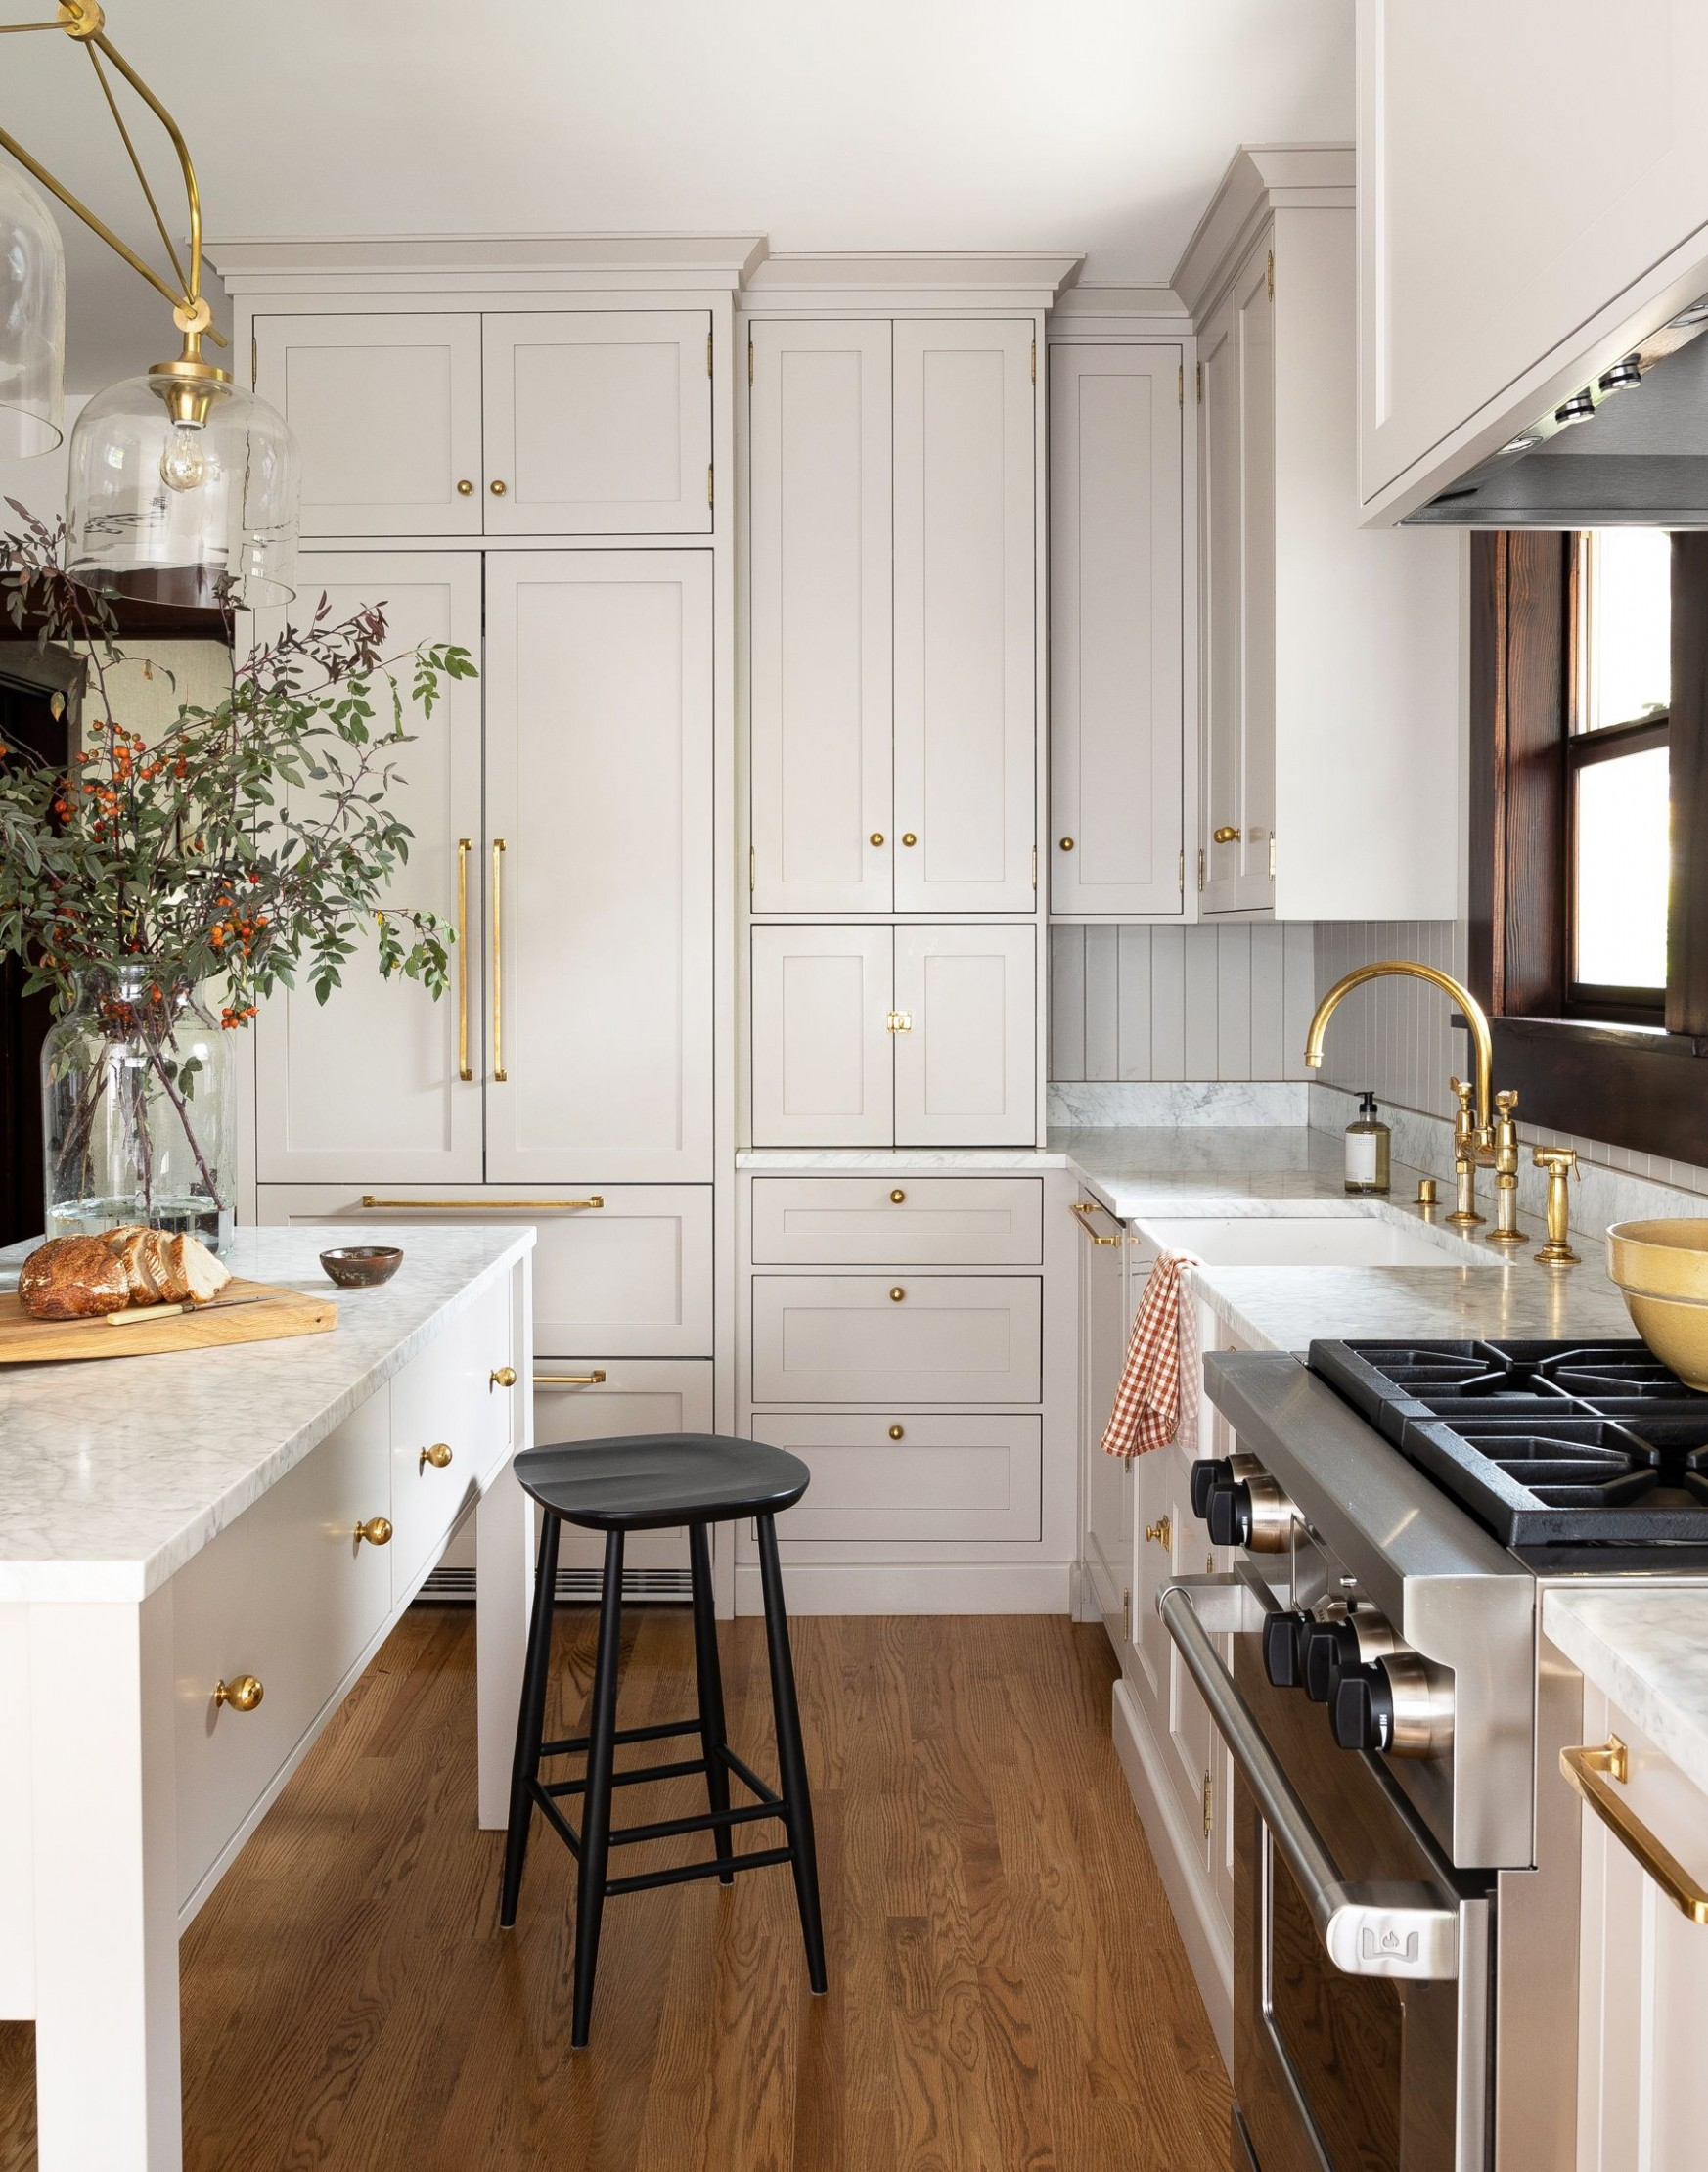 12 Kitchen Cabinet Design Ideas 12 - Unique Kitchen Cabinet Styles - Beautiful Kitchen Cabinets For Sale